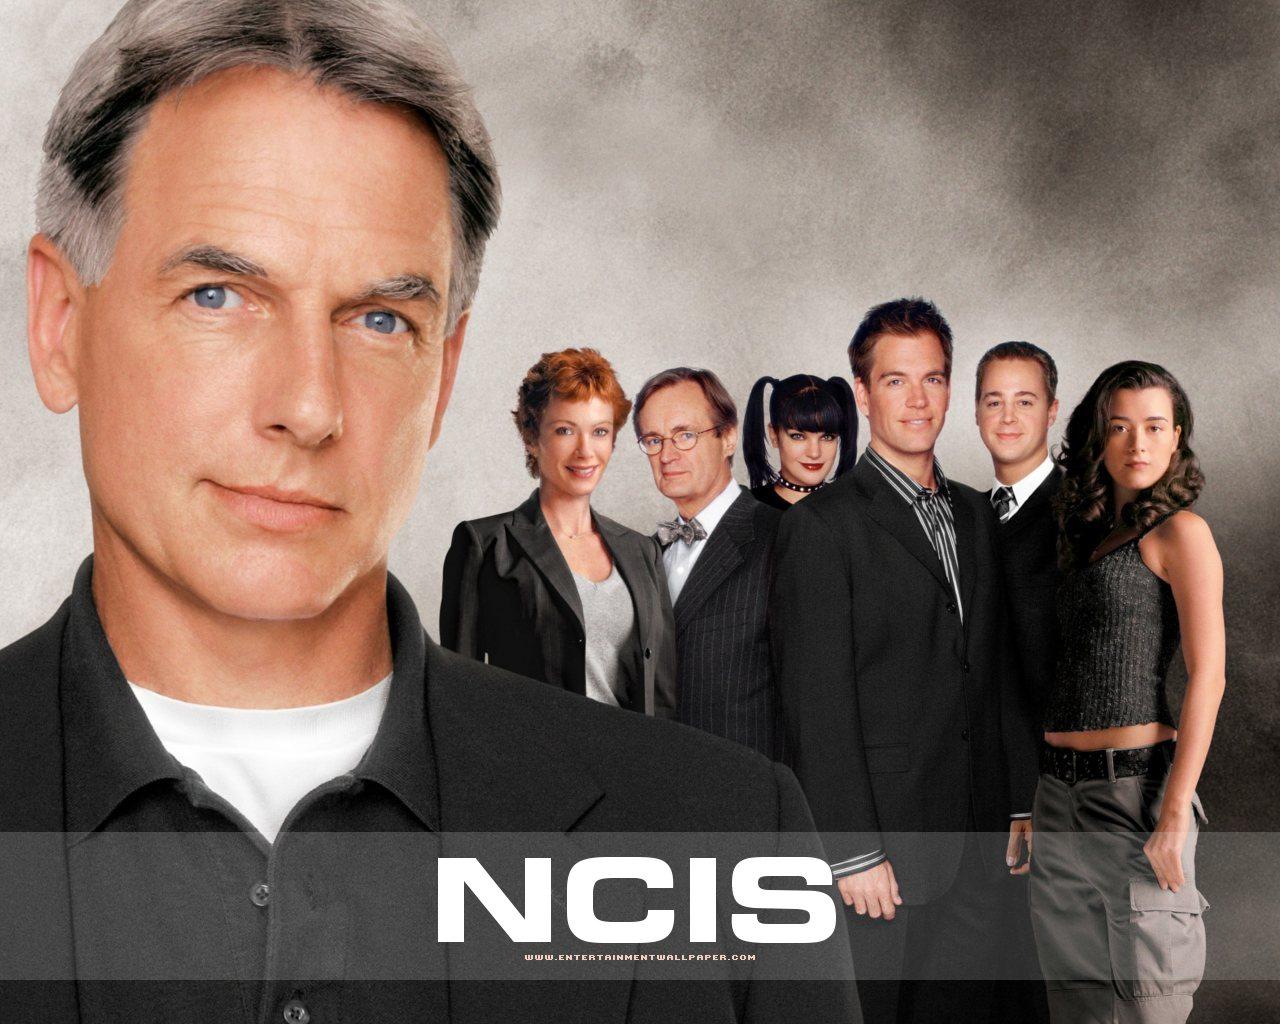 ncis tv series cast - photo #4